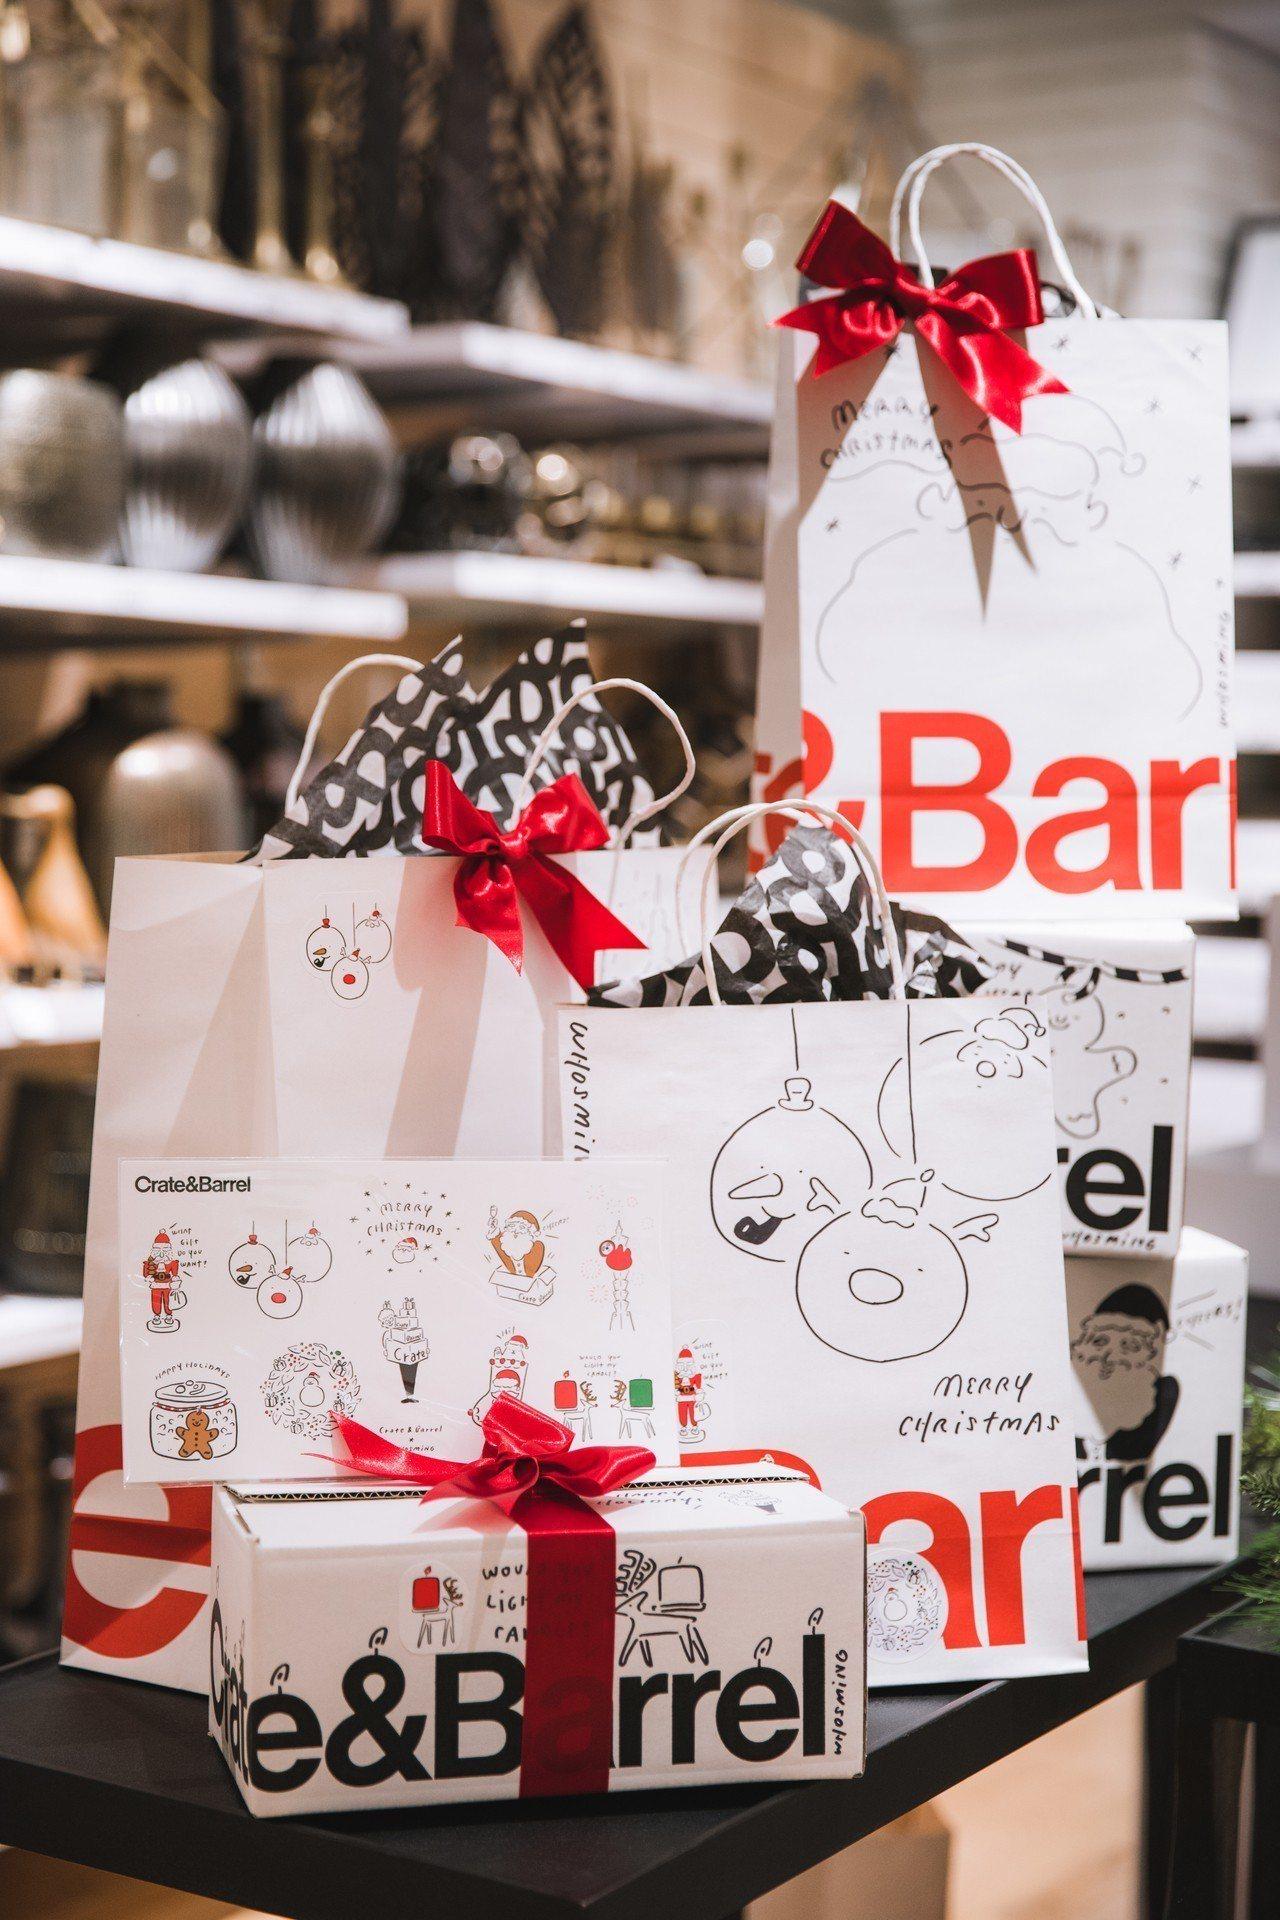 Crate and Barrel與插畫家WHOSMiNG攜手合作,推出獨家聖誕限...